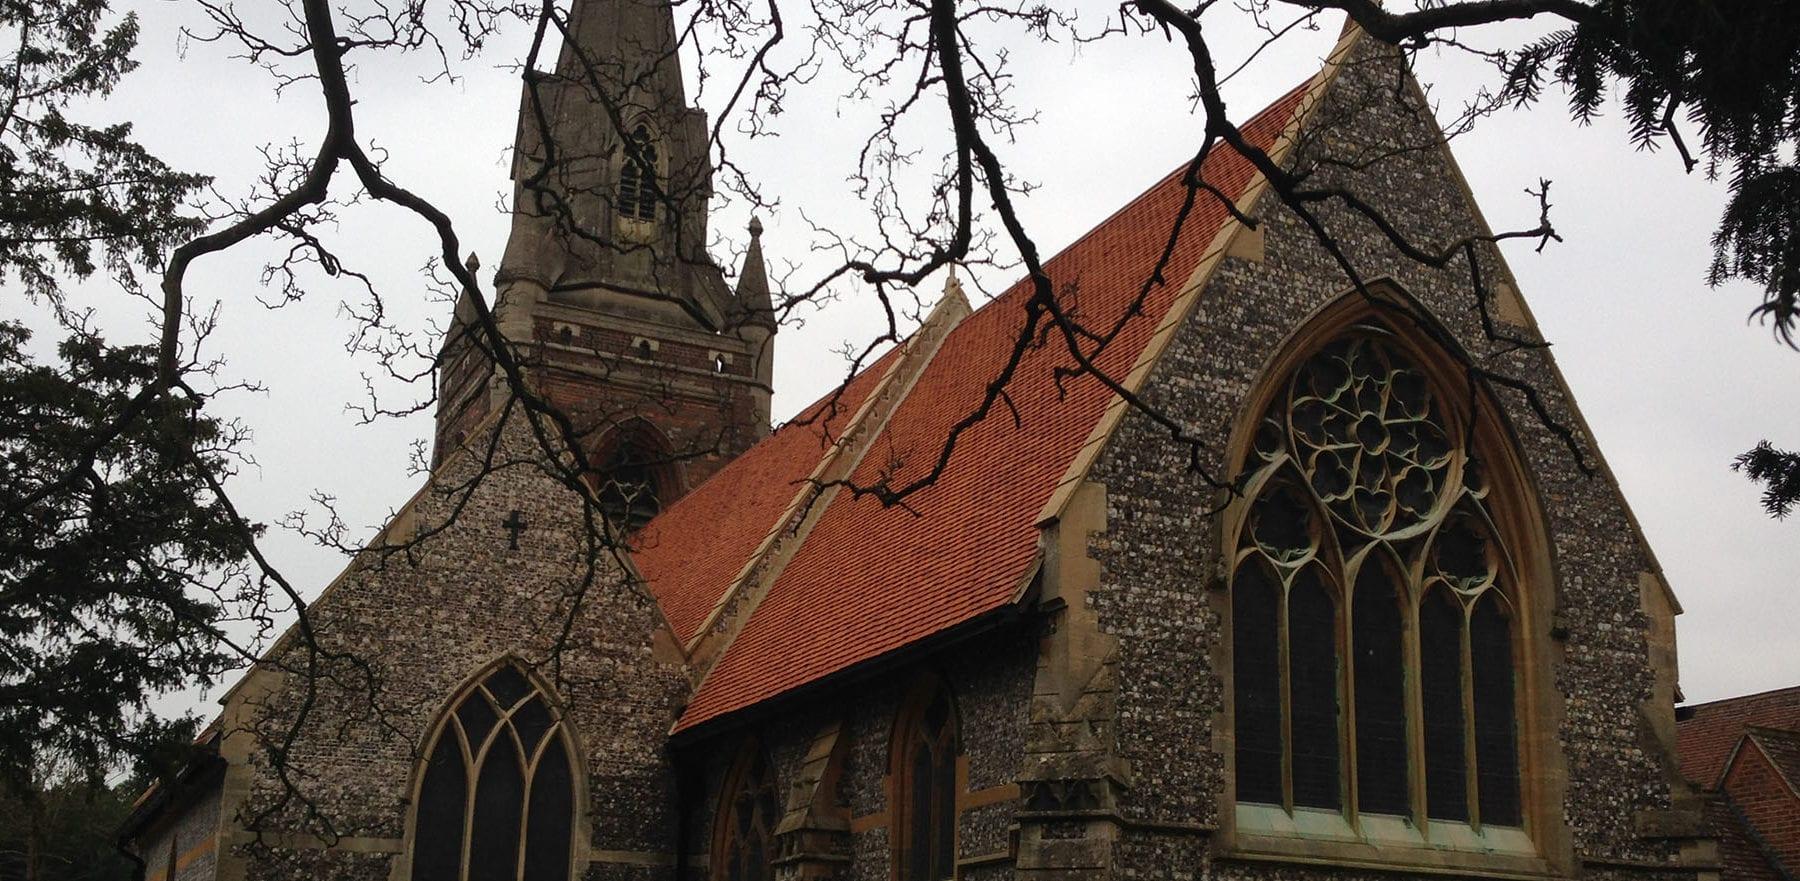 Lifestiles - Handmade Orange Clay Roof Tiles - Berkshire, England